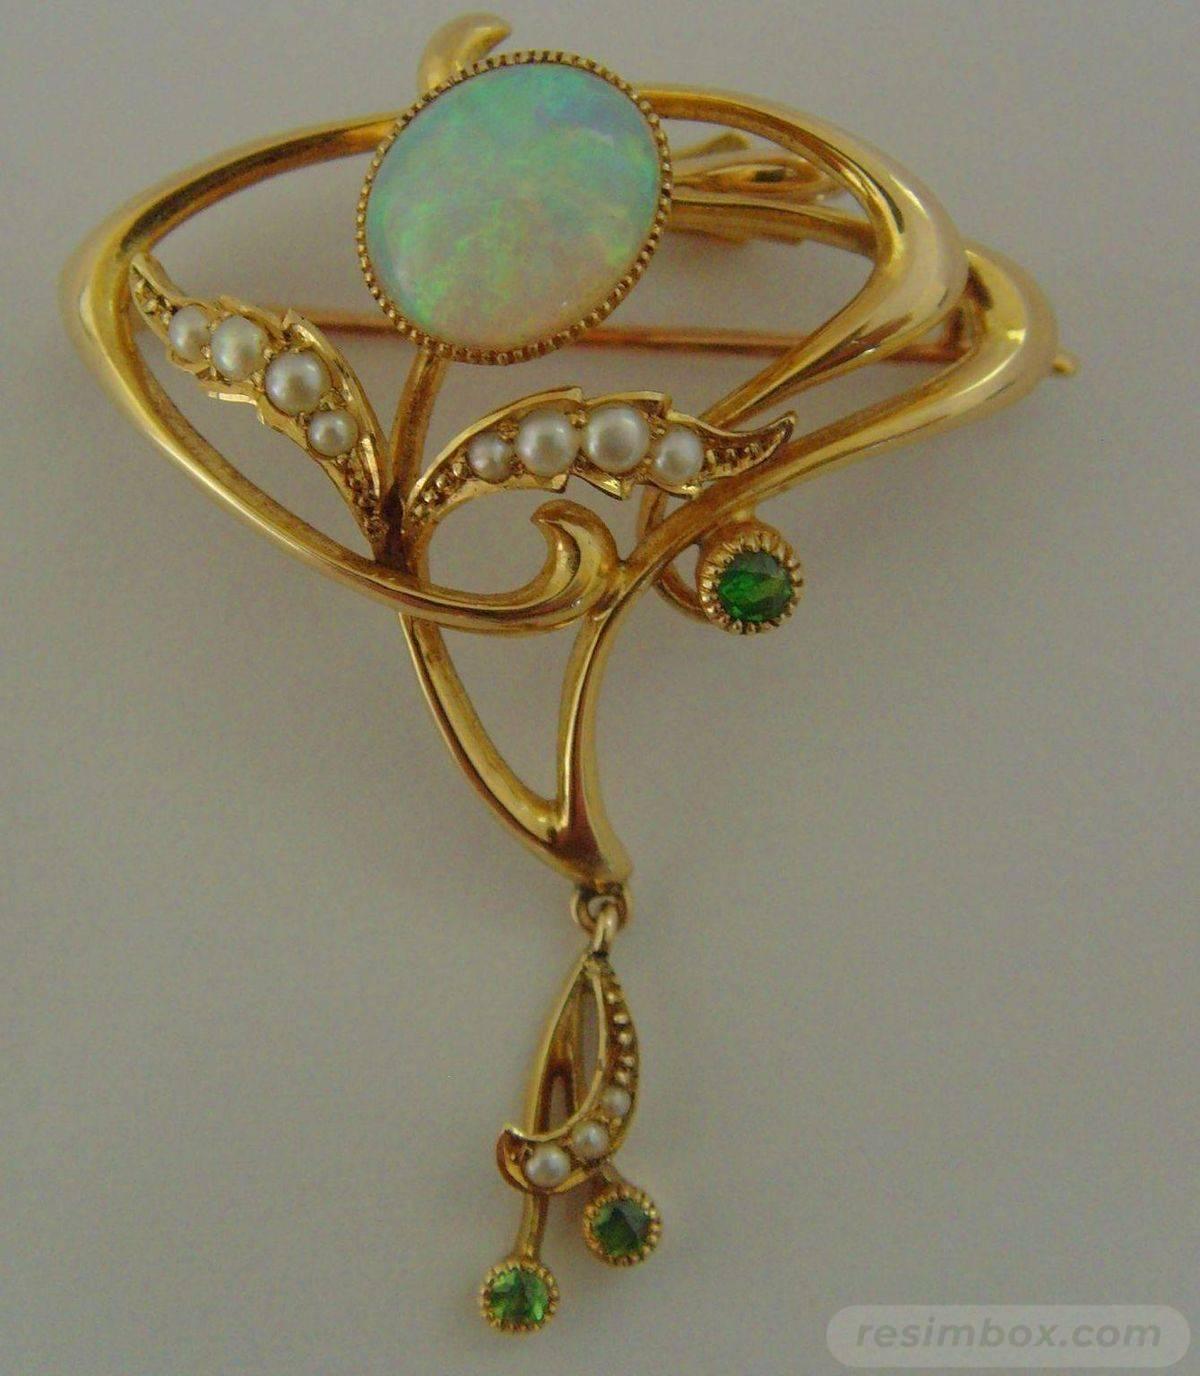 Art deco jewelry-514958538637333603